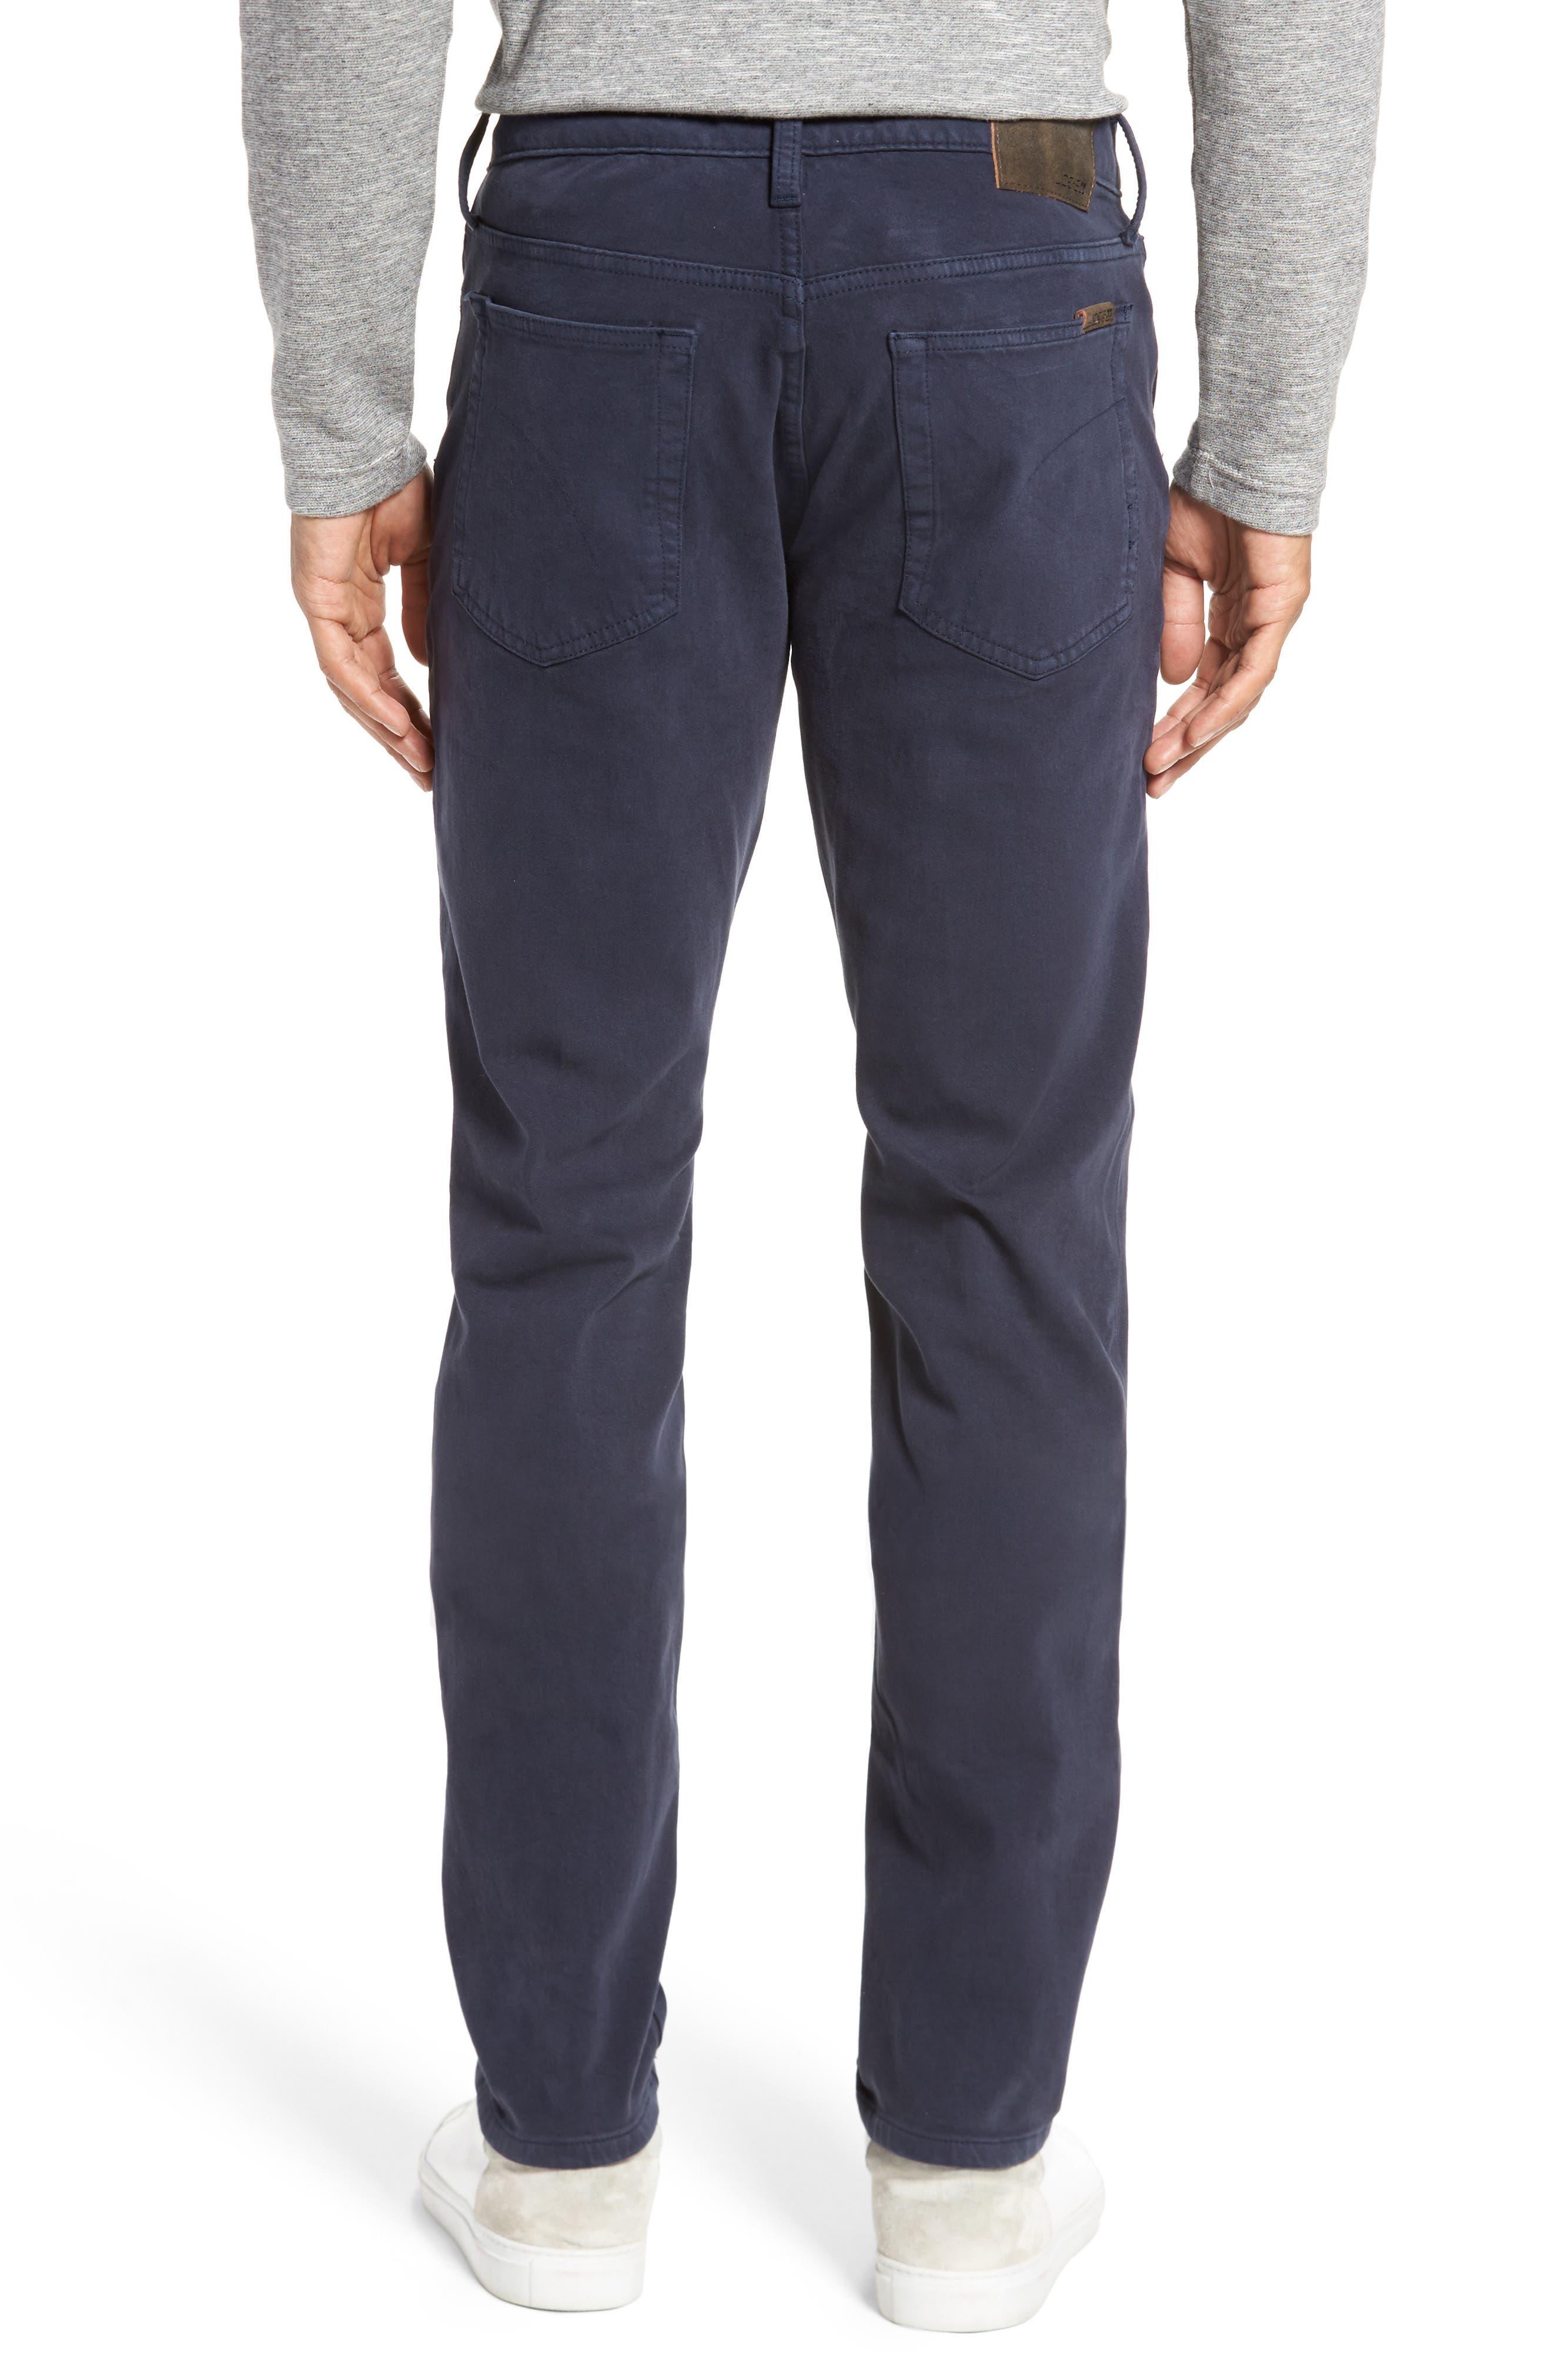 Kinetic Slim Fit Twill Pants,                             Alternate thumbnail 2, color,                             NAVY